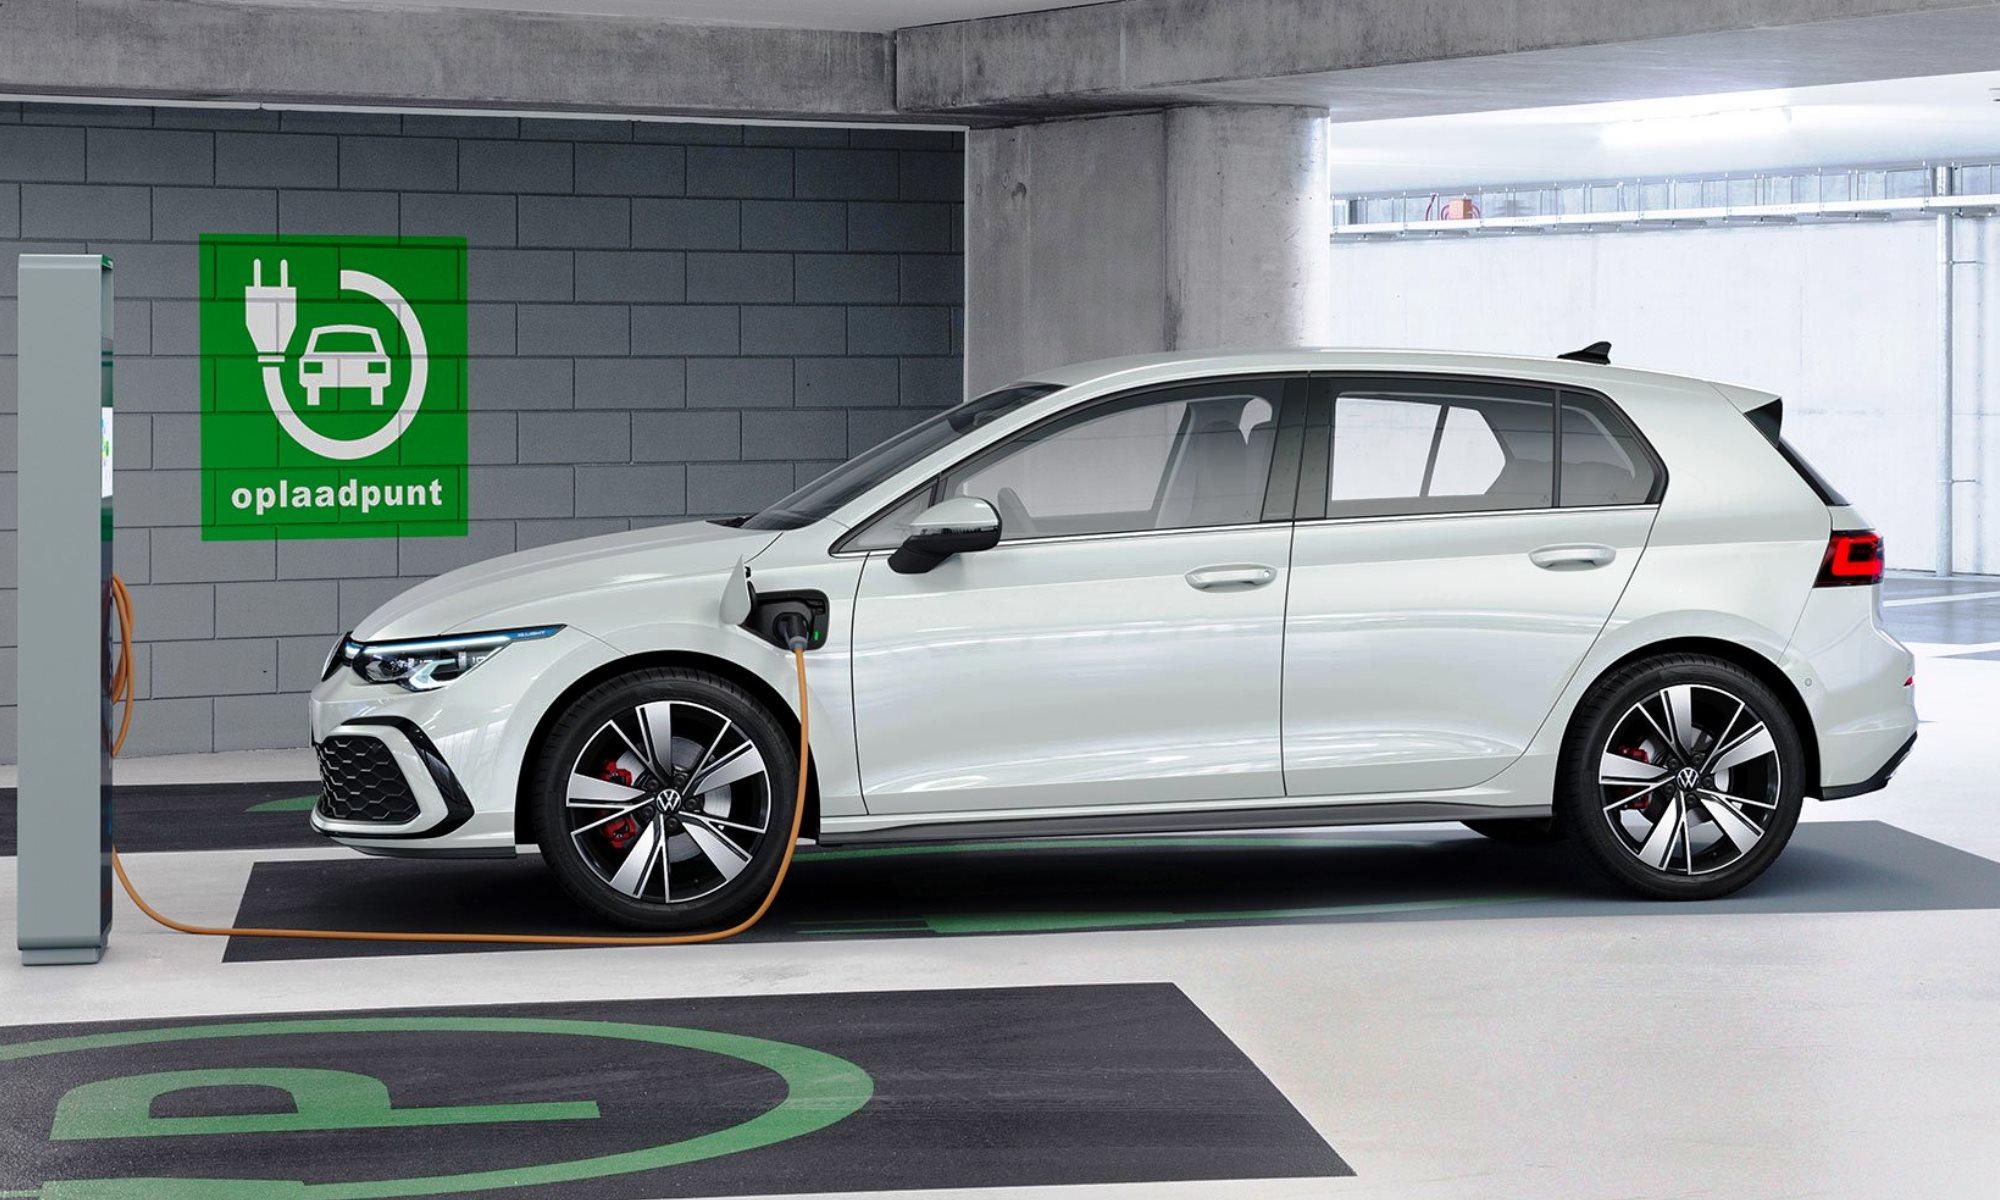 VW Golf 8 charging